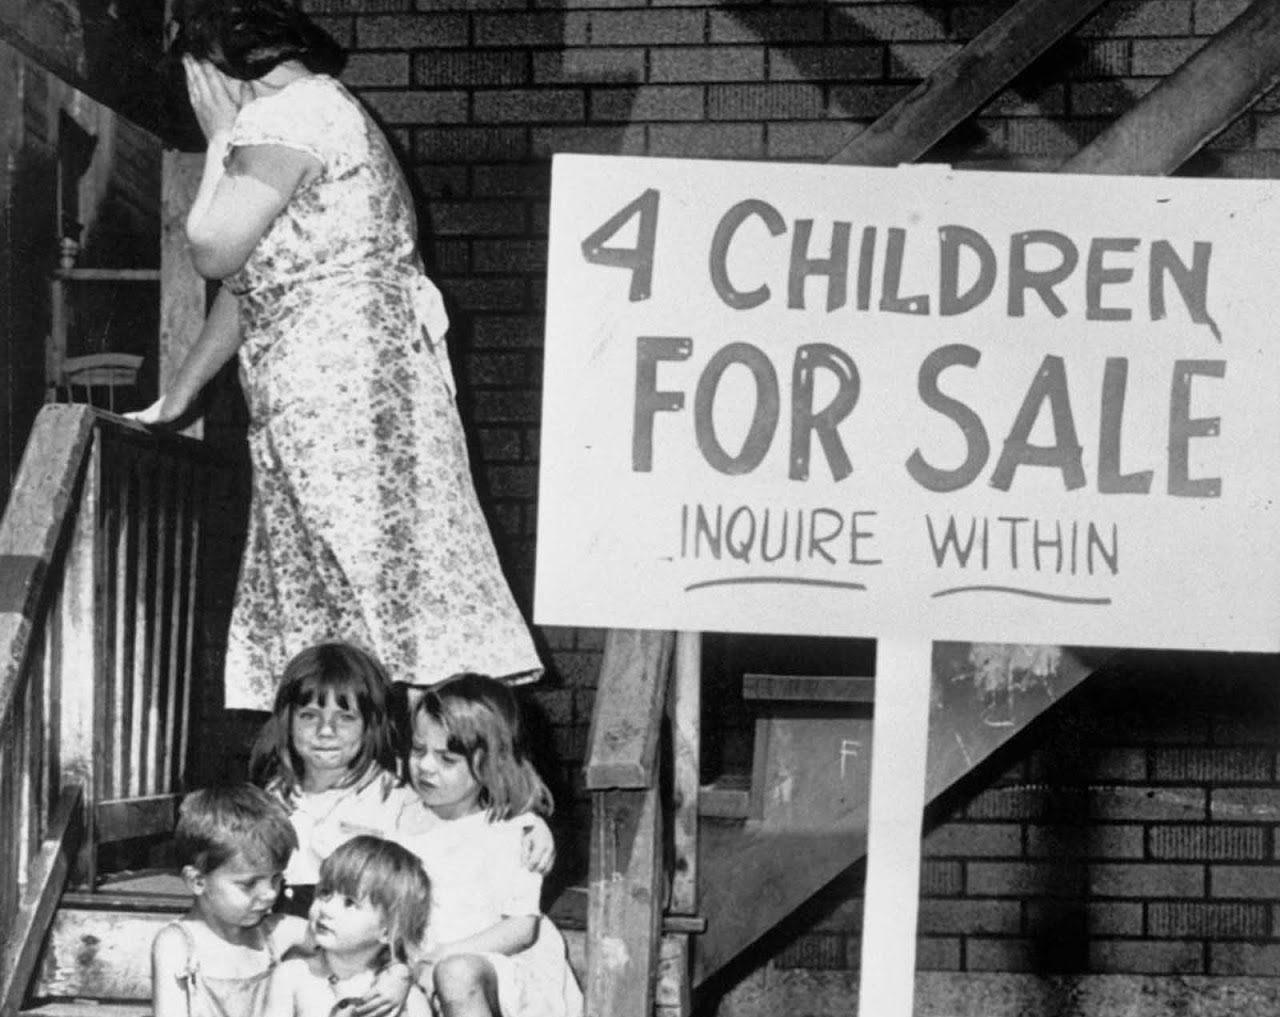 sad sale of childrens clothing